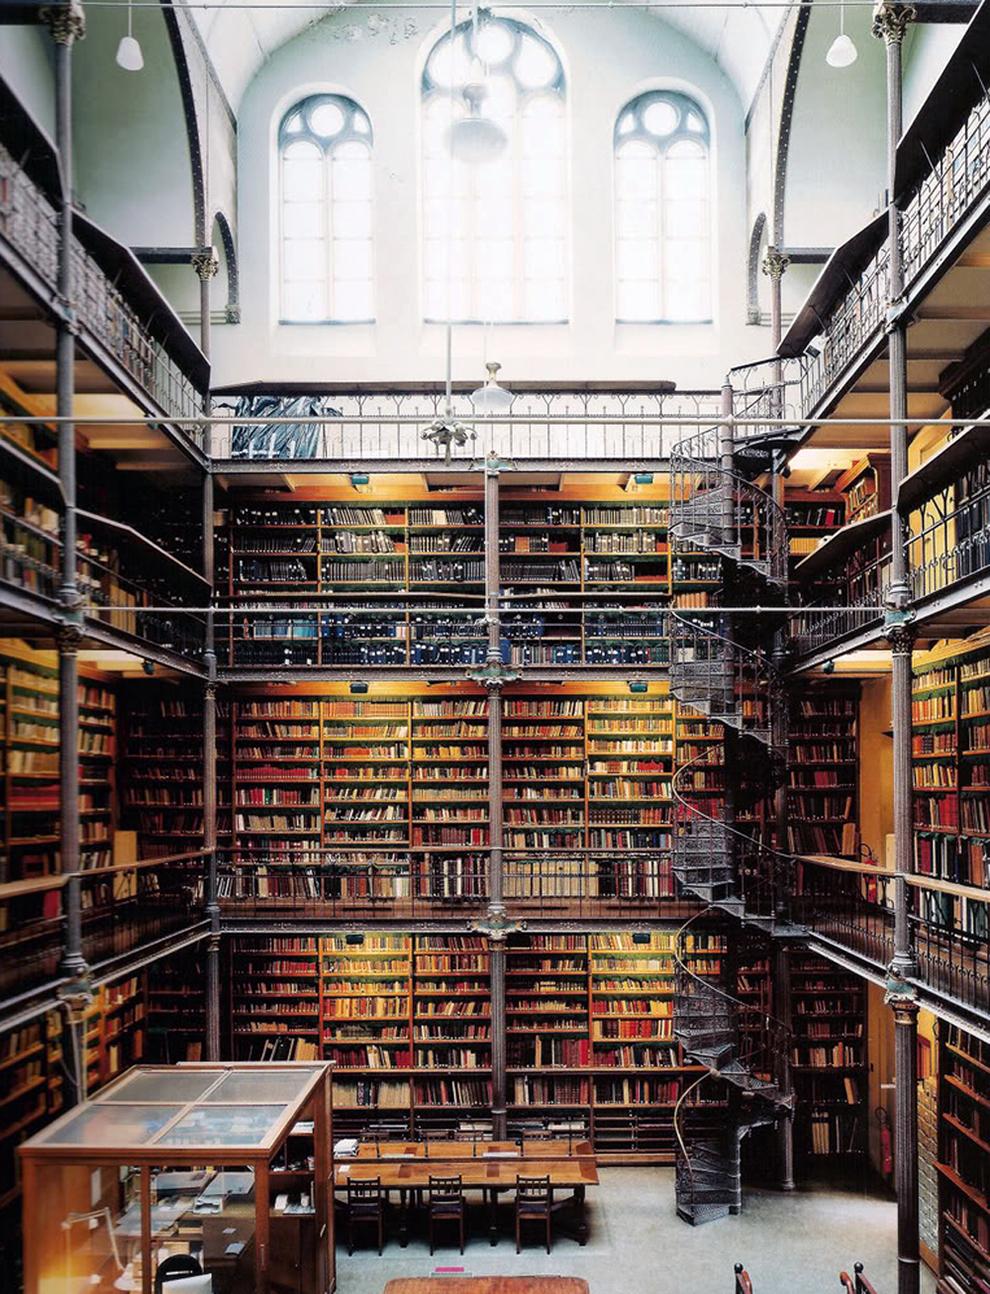 fotografía Candida Höfer Biblioteca del Rijksmusuem, Ámsterdam